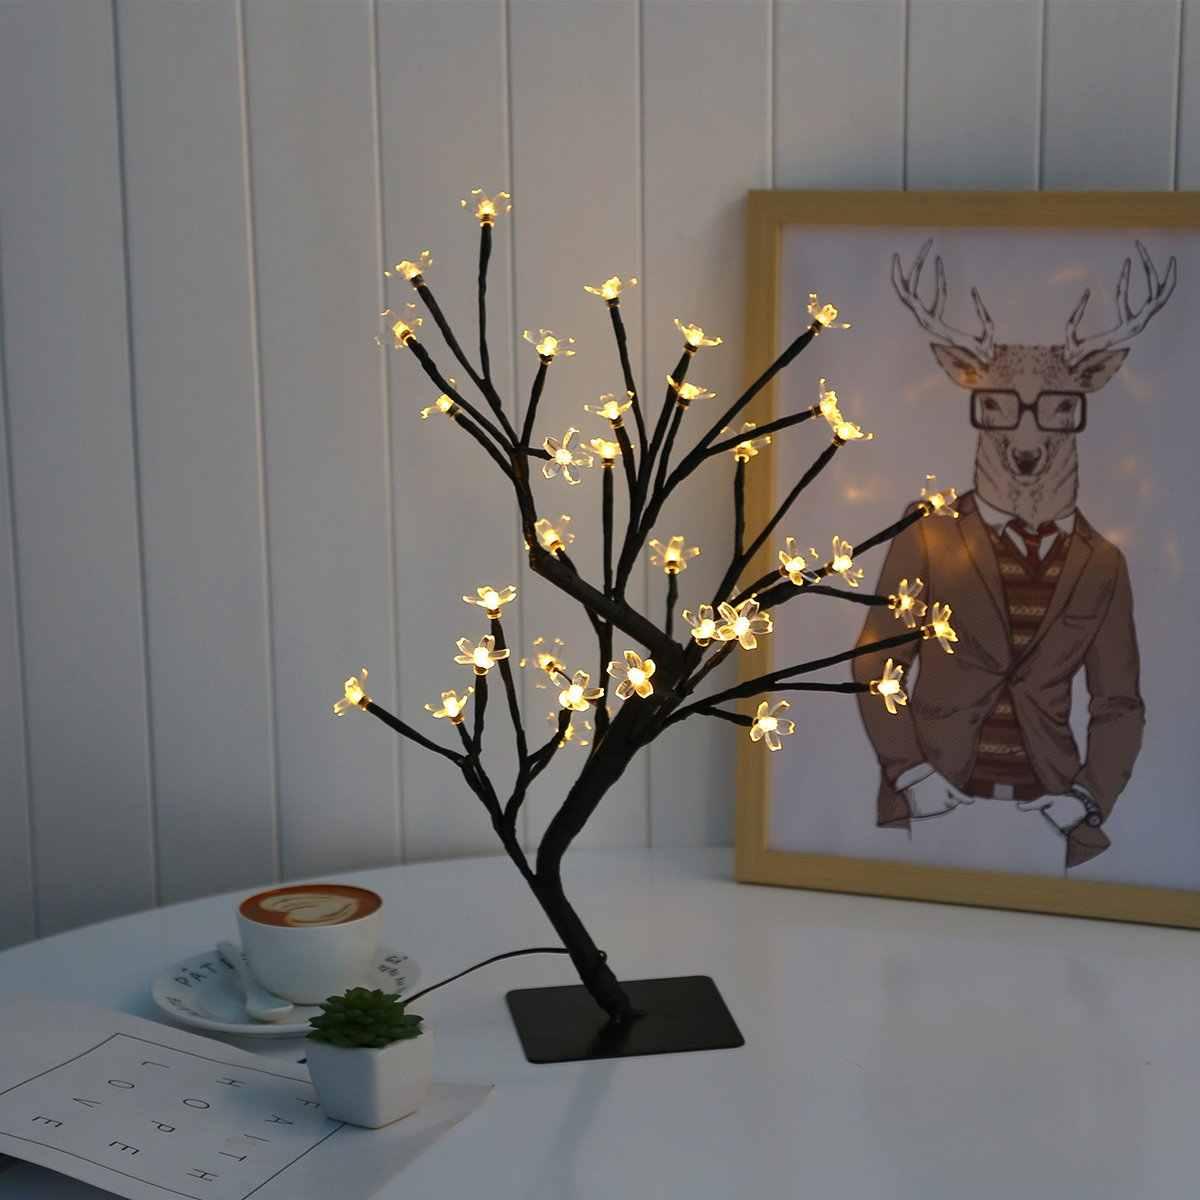 18 Inch Cherry Blossom Bonsai Tree 48 Led Lights Warm White Lights Ideal As Night Lights Home Gift Idea Night Lights Aliexpress